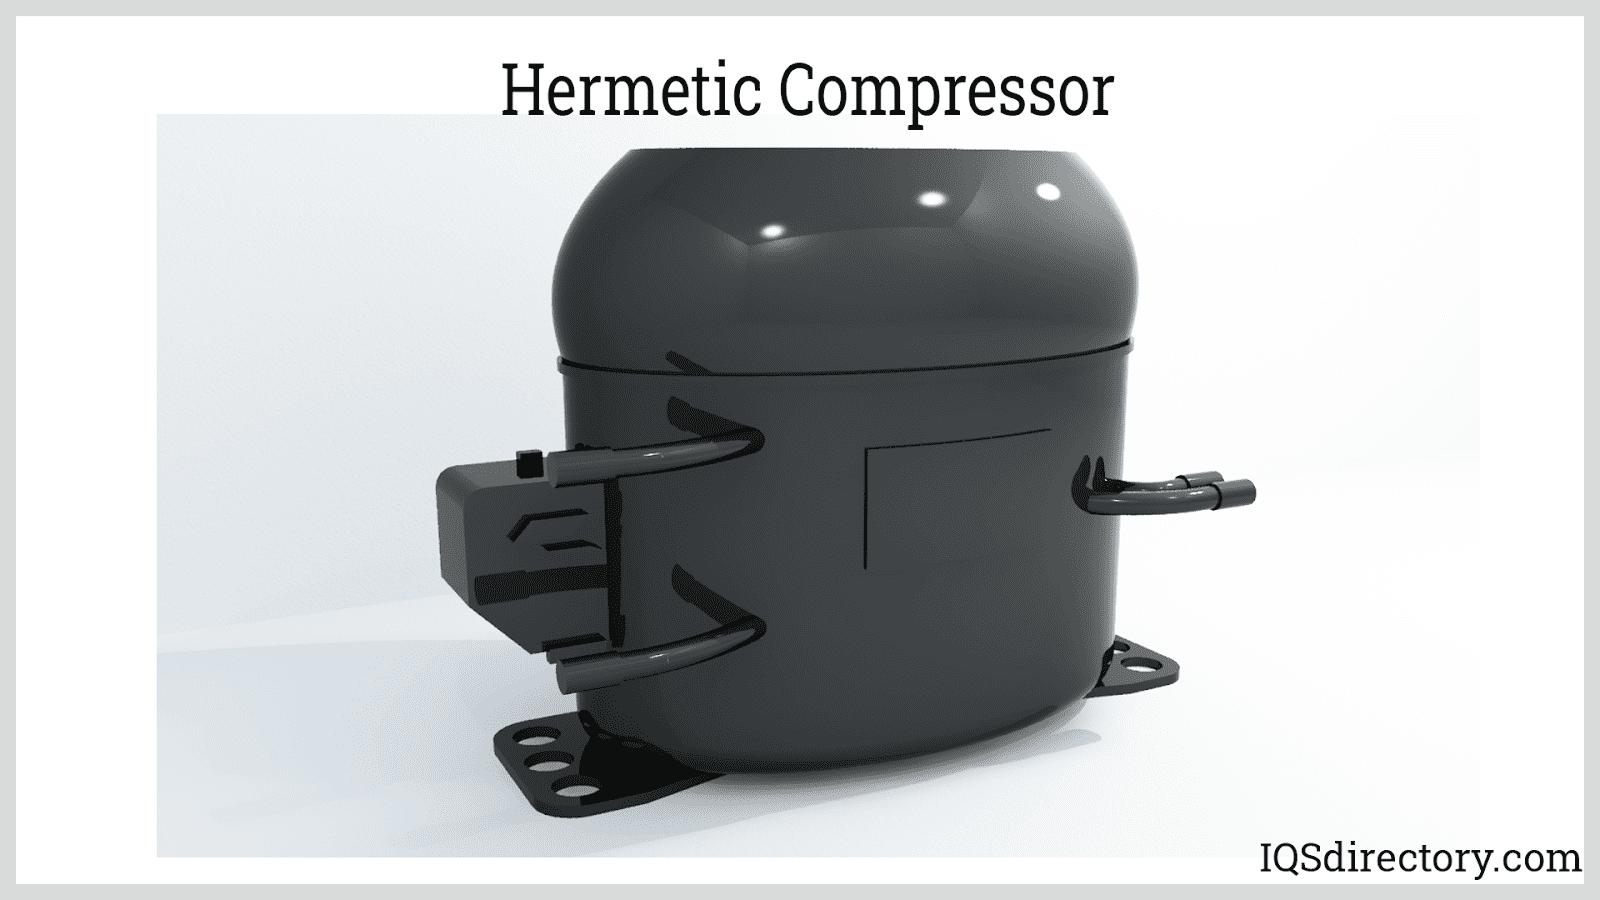 Hermetic Compressor